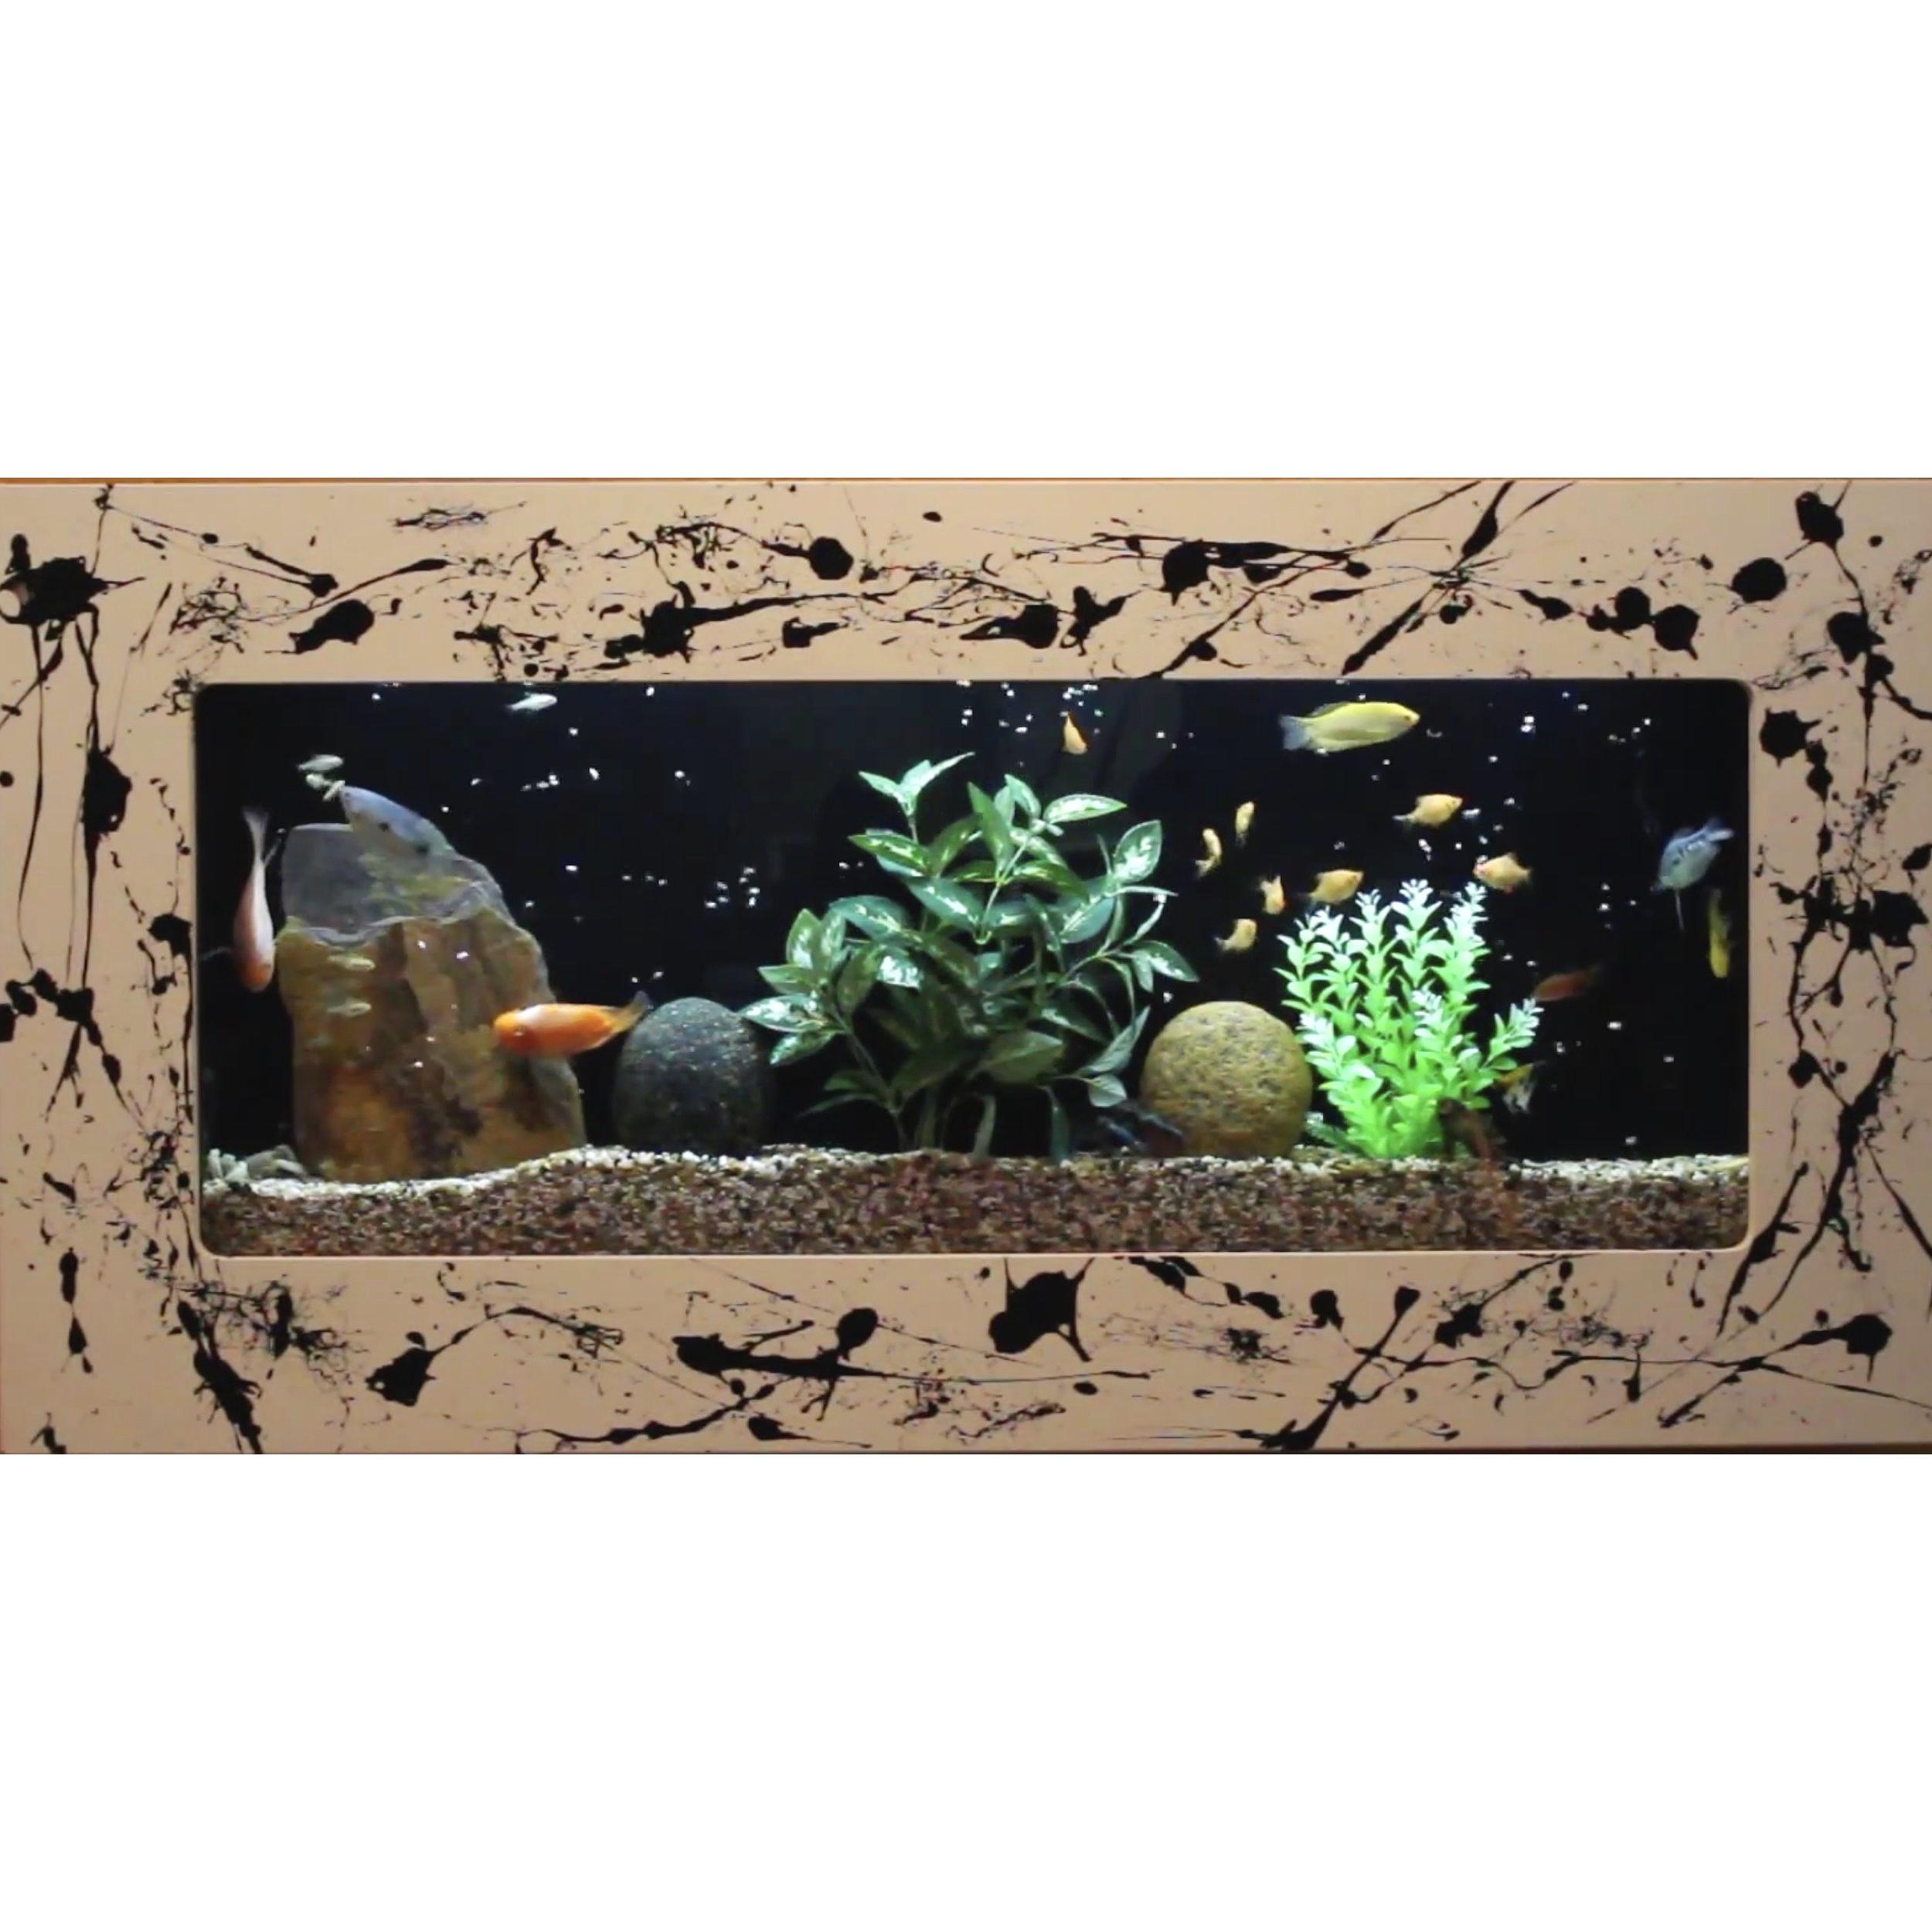 moder+fish+tanks.jpg